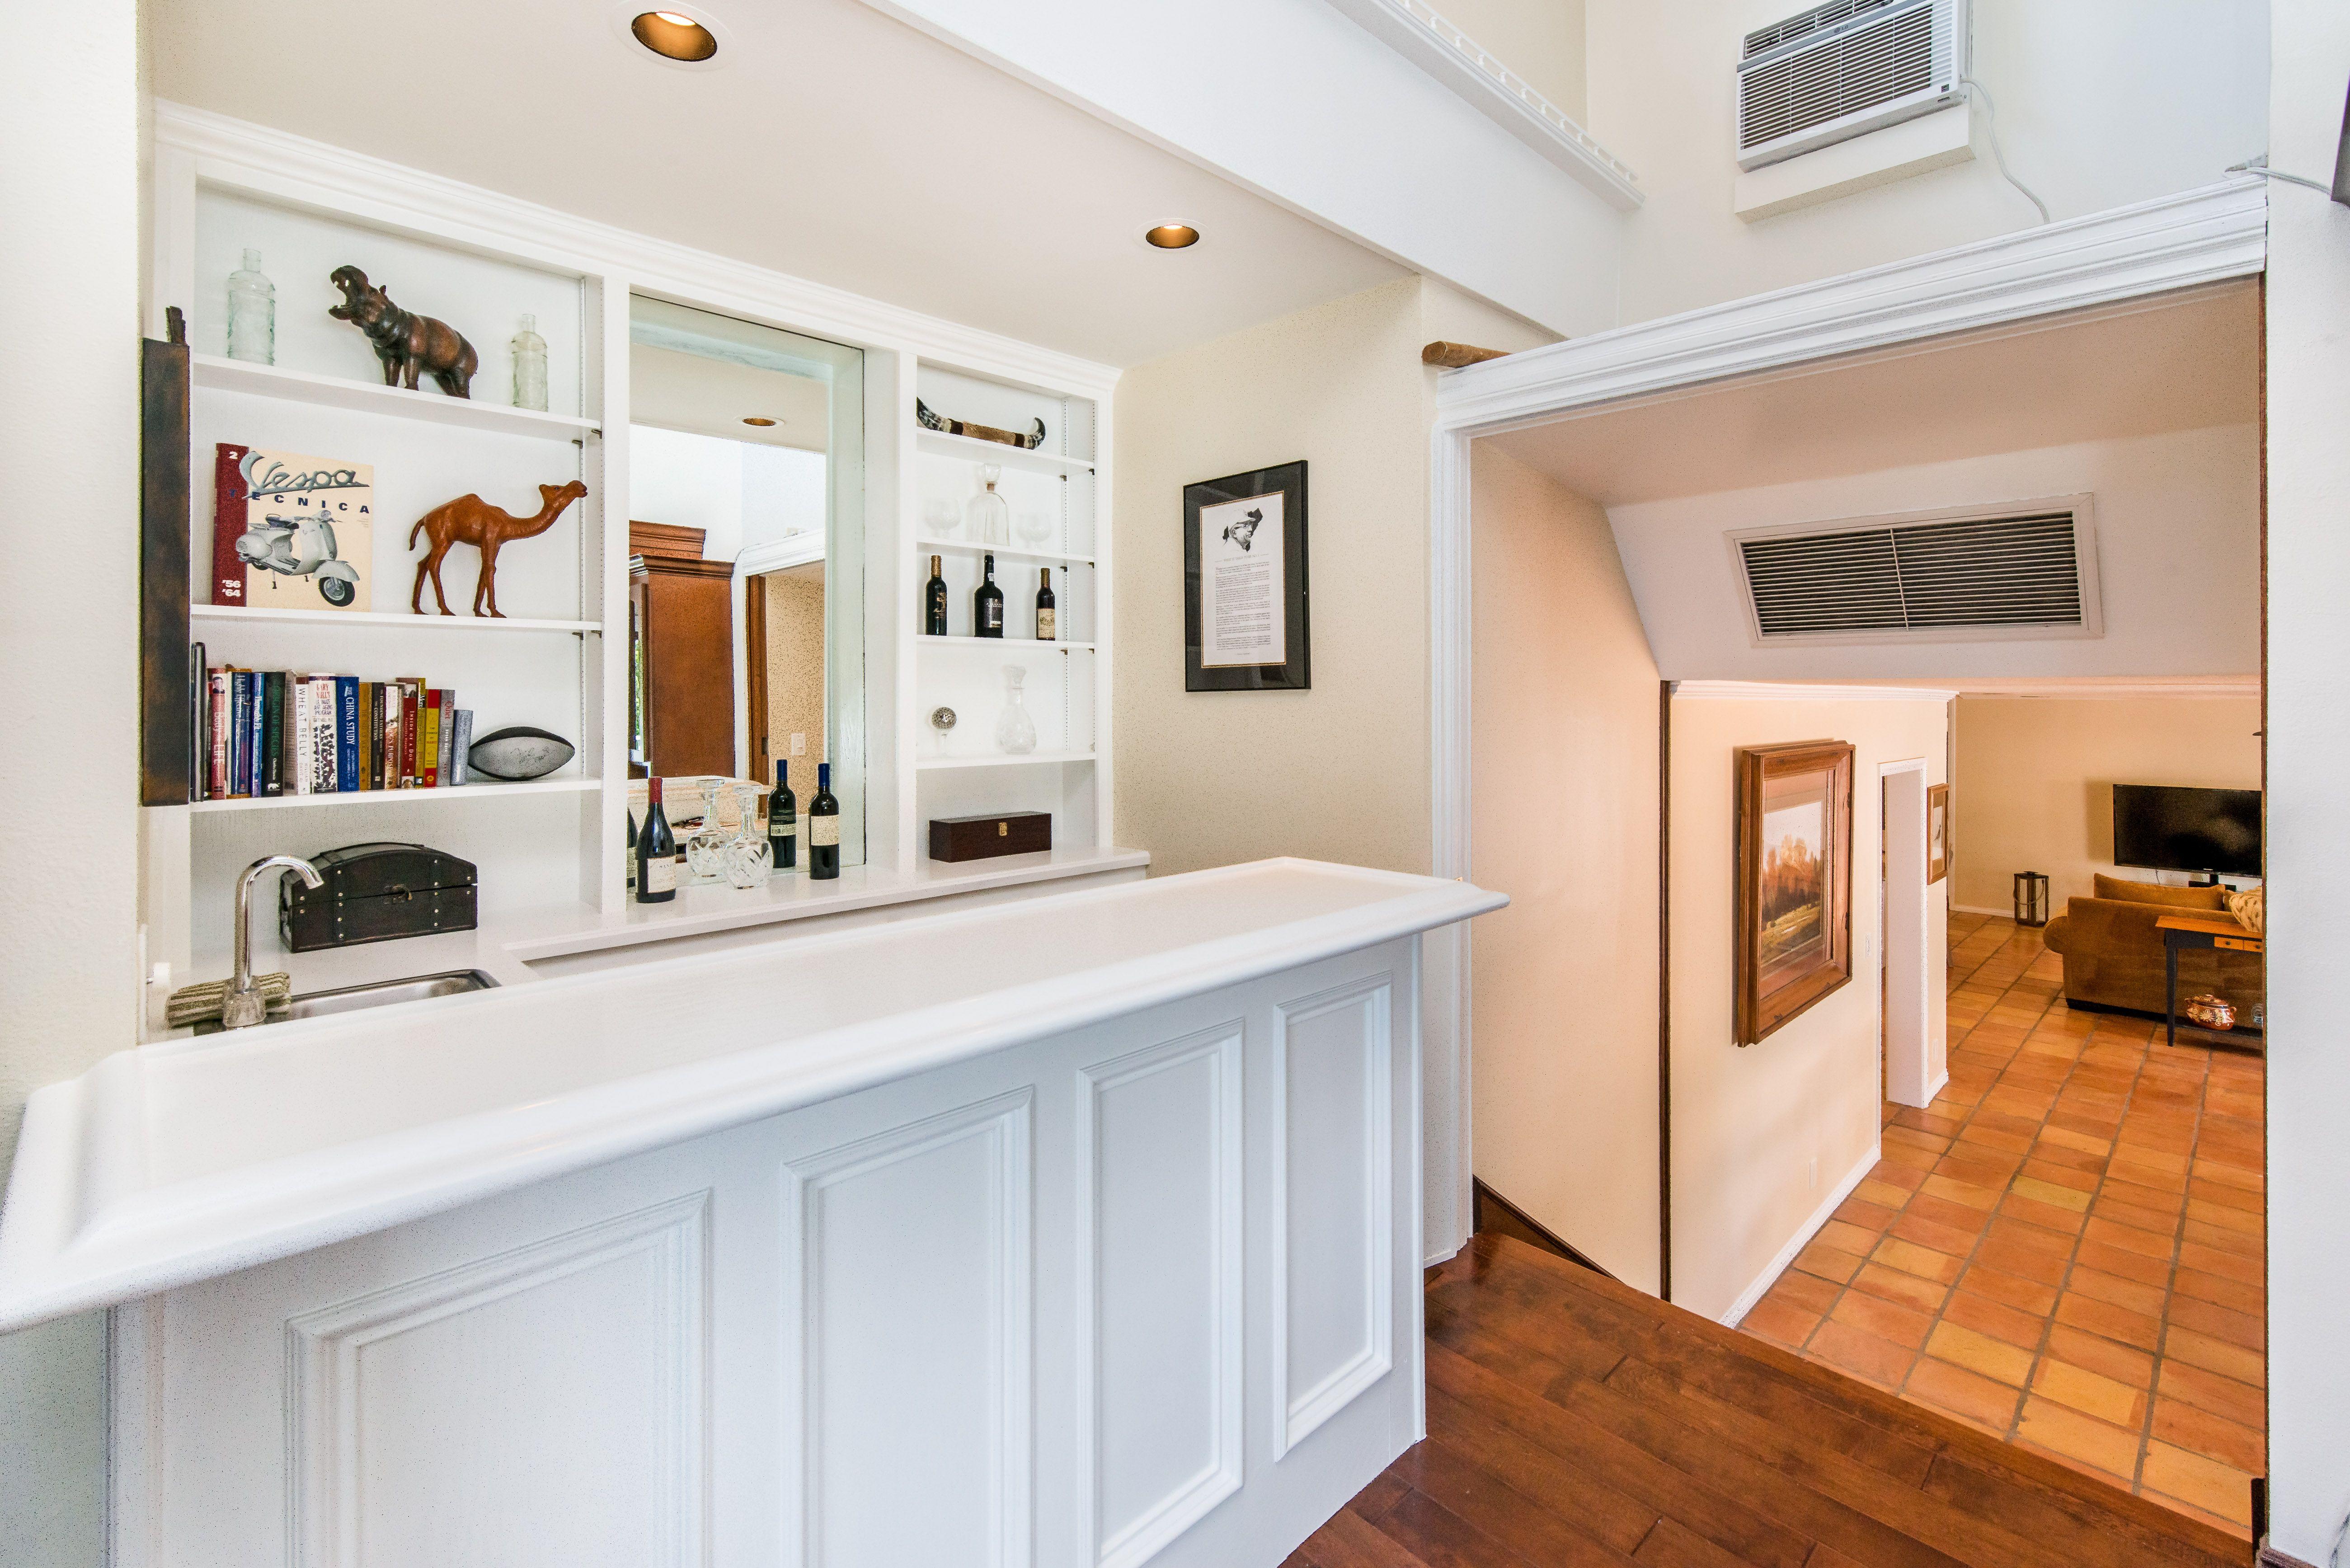 Pin by Caruso Real Estate on Sold- 10771 Morada, Orange ...